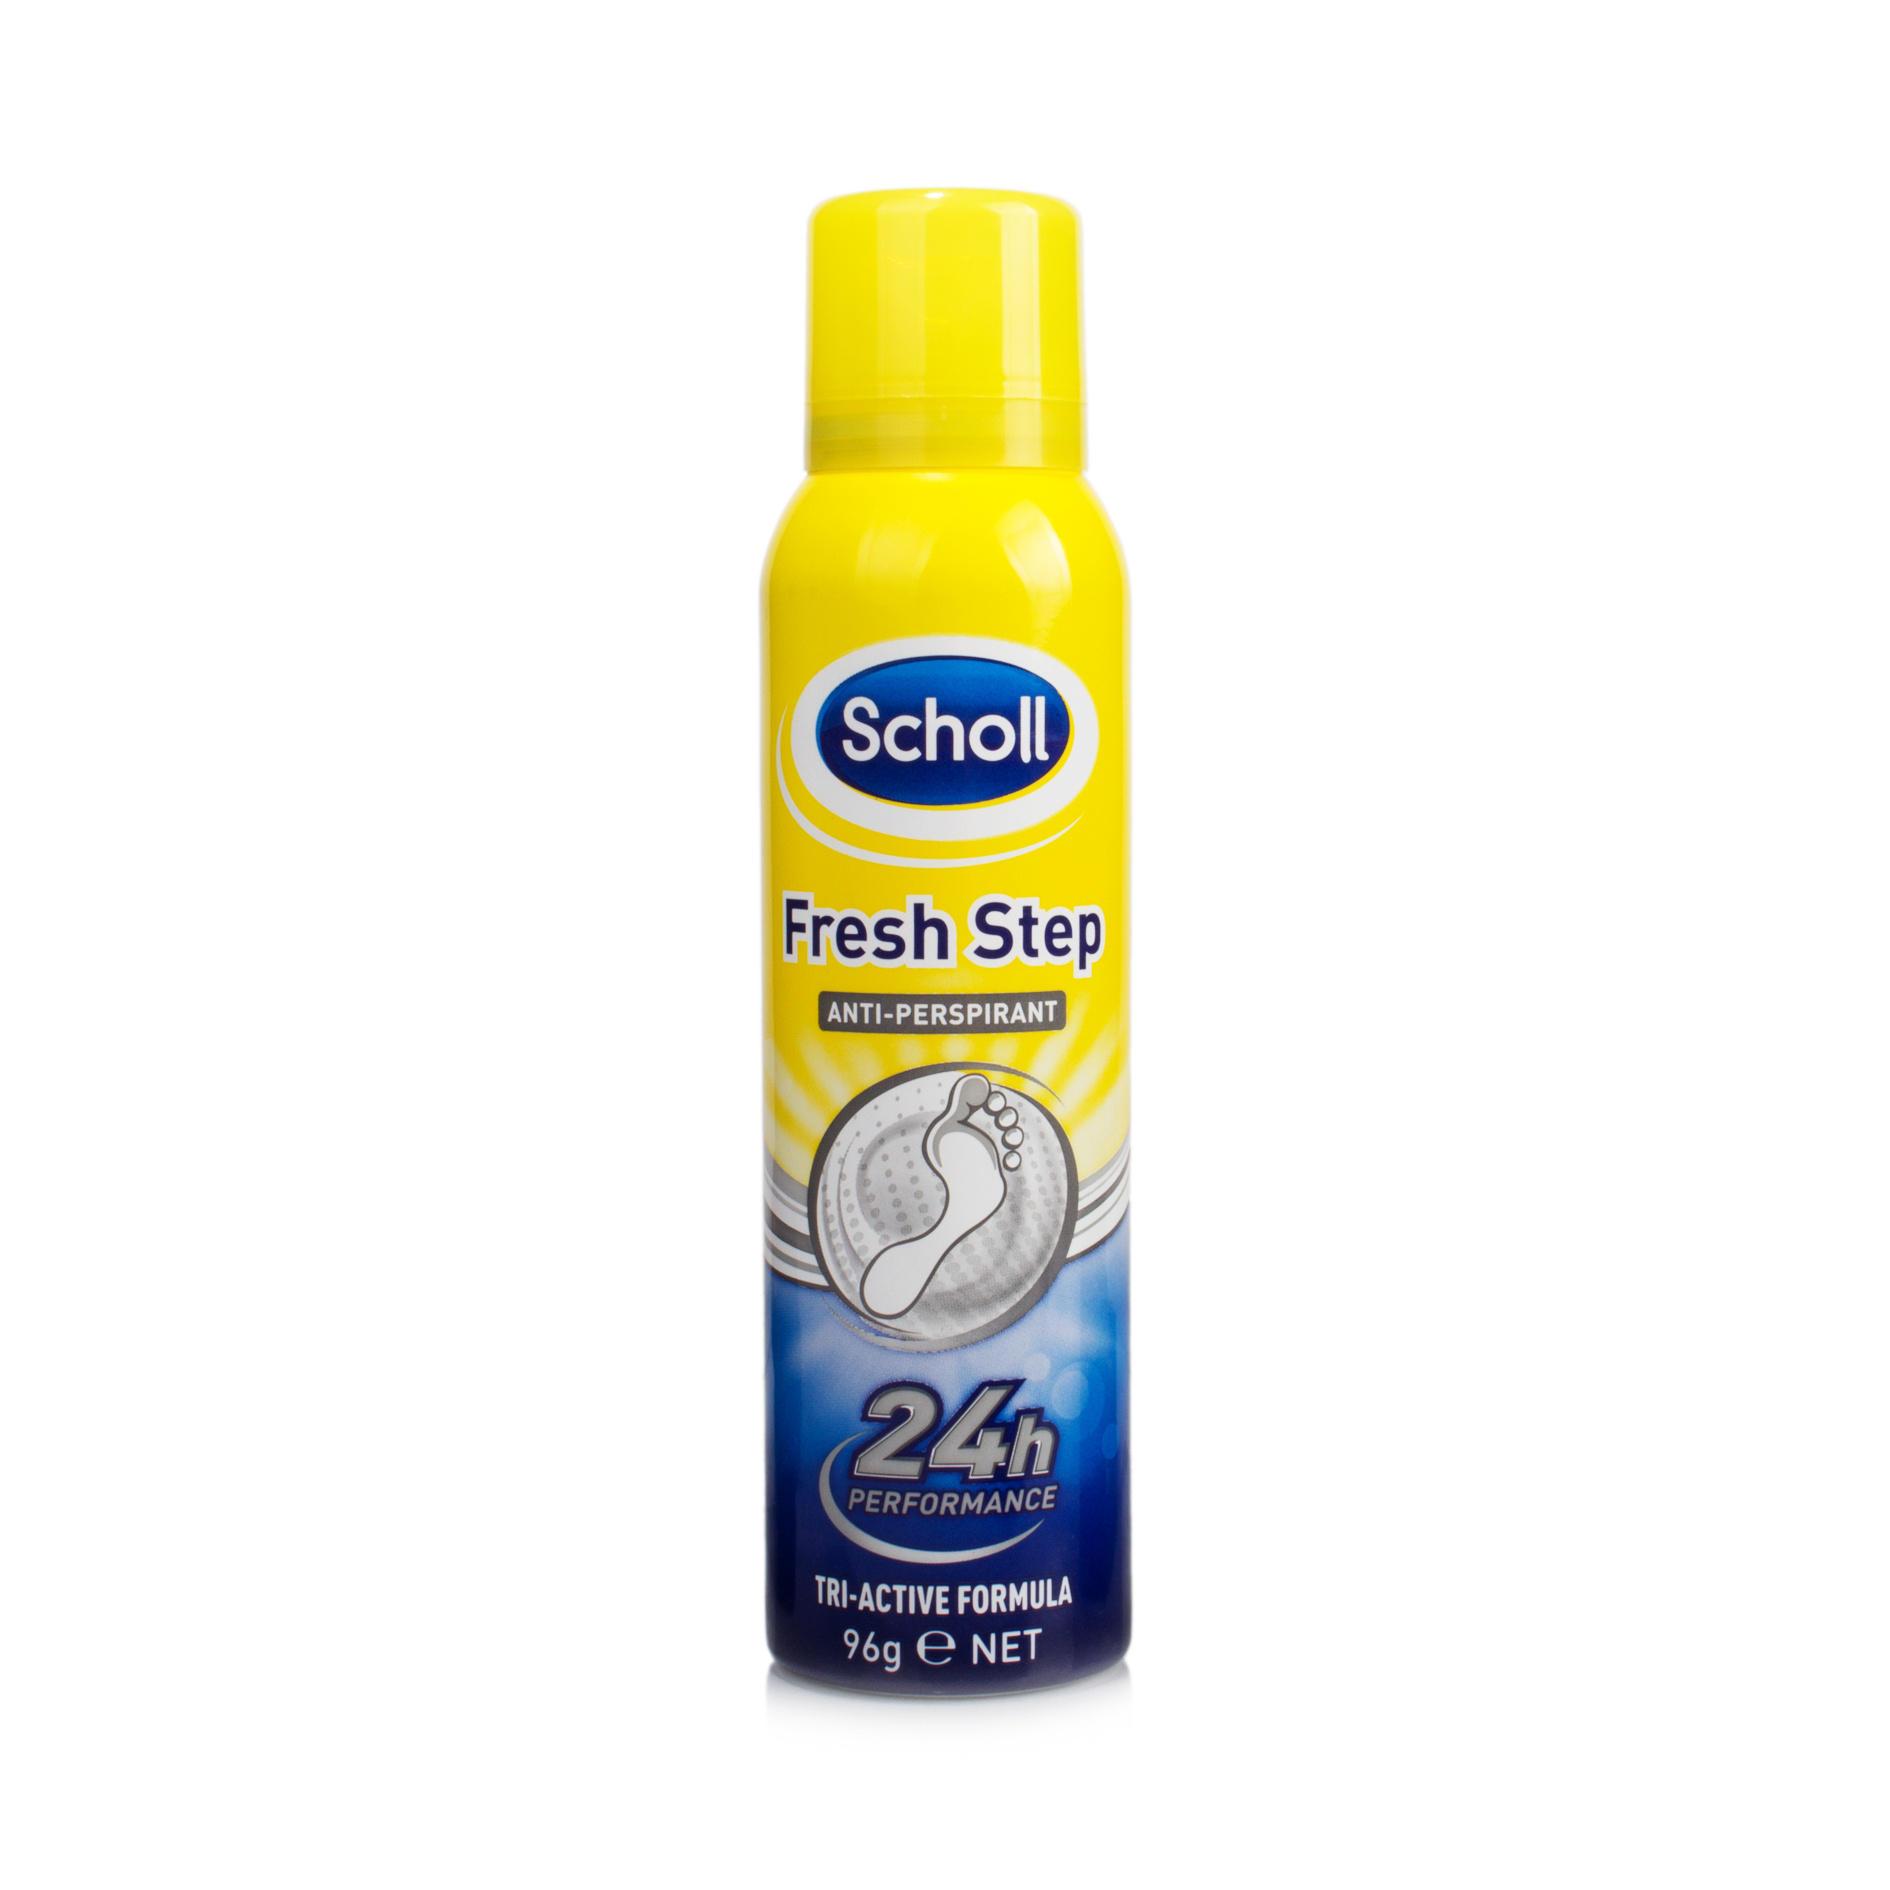 Scholl Fresh Step Foot Spray